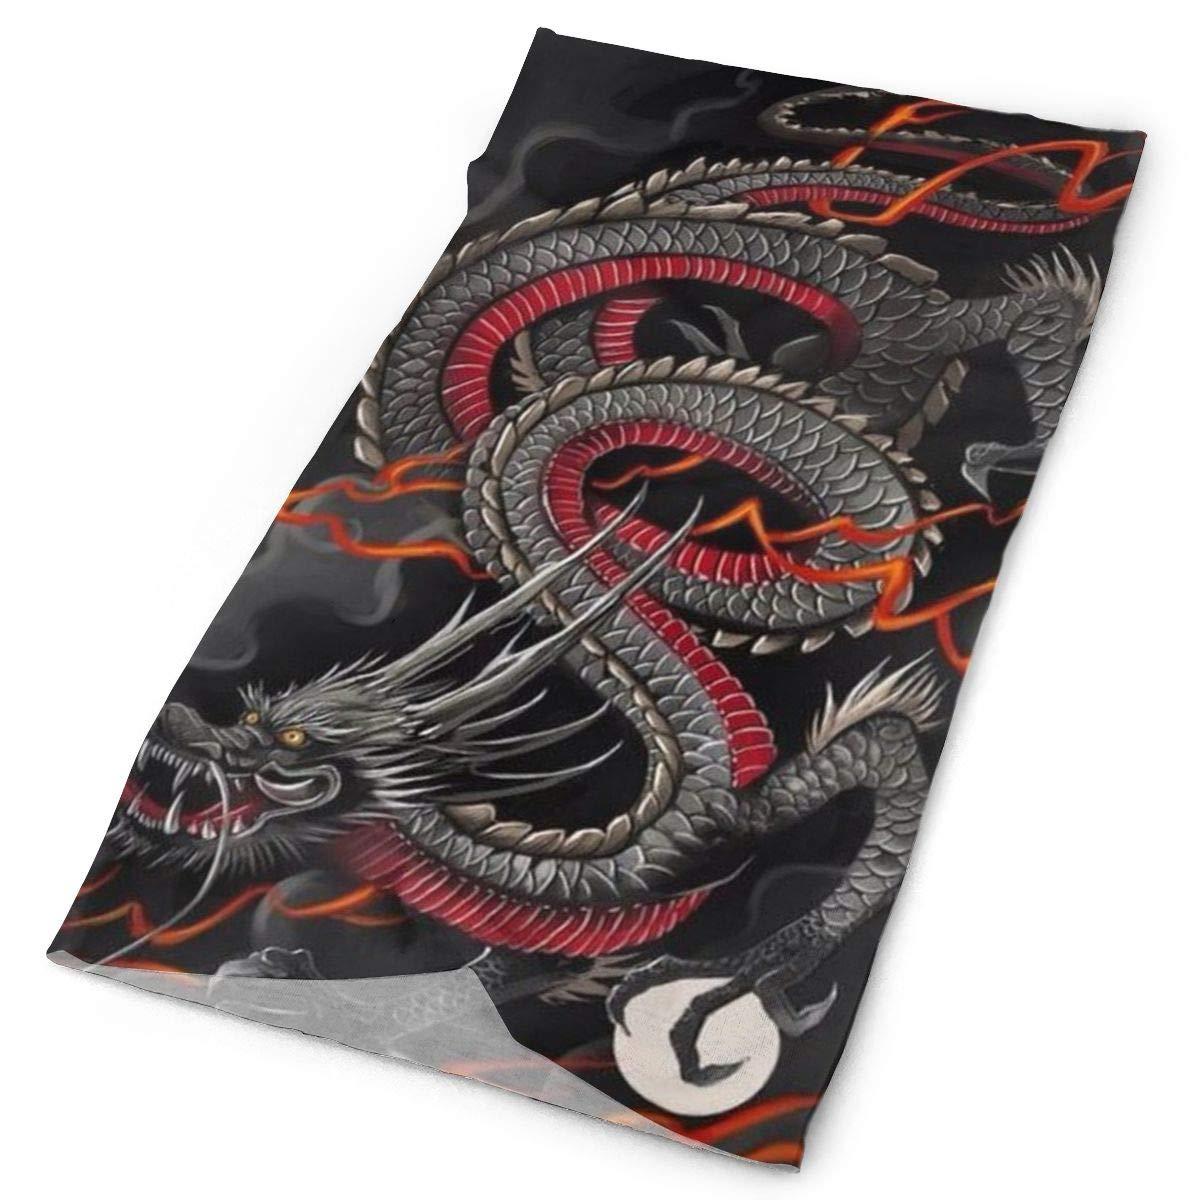 SHINYWEET Black Red Chinese Dragon Dragon Ball Art Headwear - 16 Ways to Wear Headband/Neck Gaiter/Bandana/Helmet